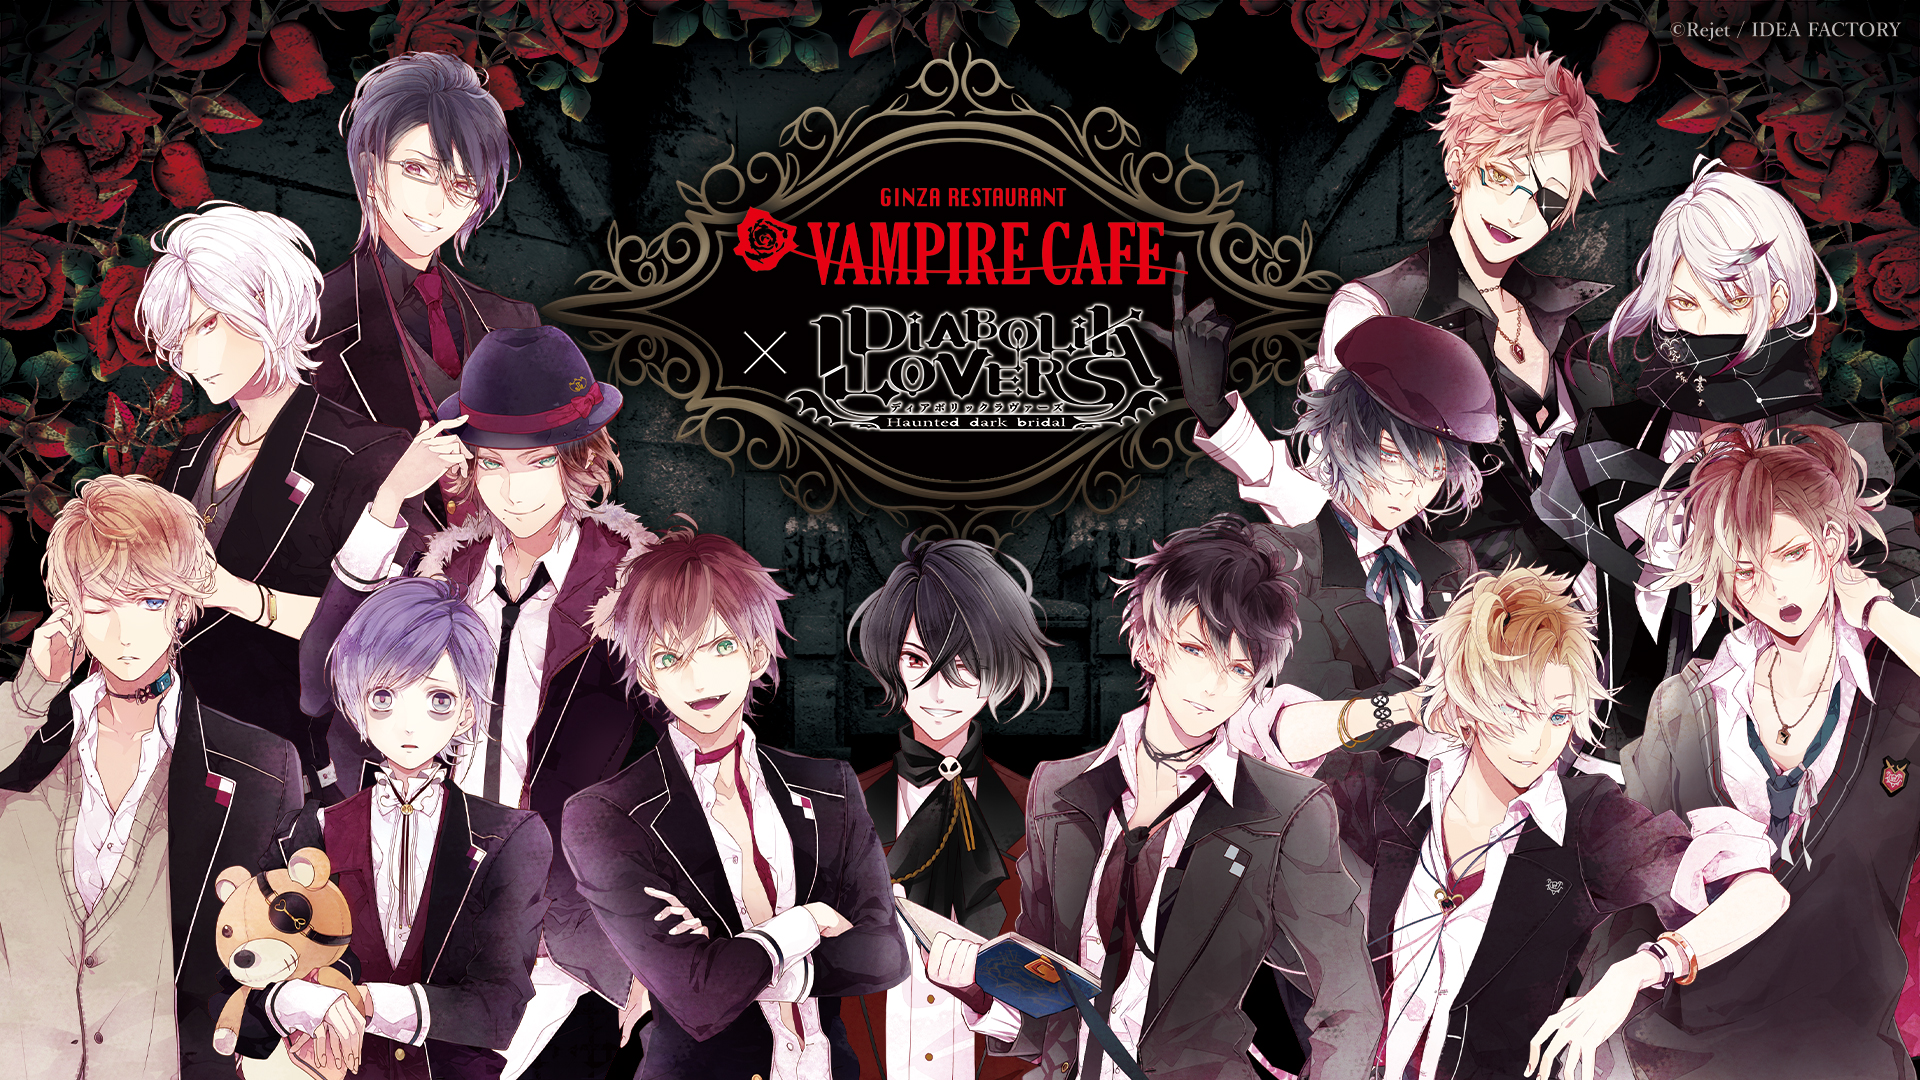 VAMPIRE CAFE×DIABOLIK LOVERS コラボレーション決定!【日程限定】コラボレーションコース&キャラクターイメージカクテル登場!